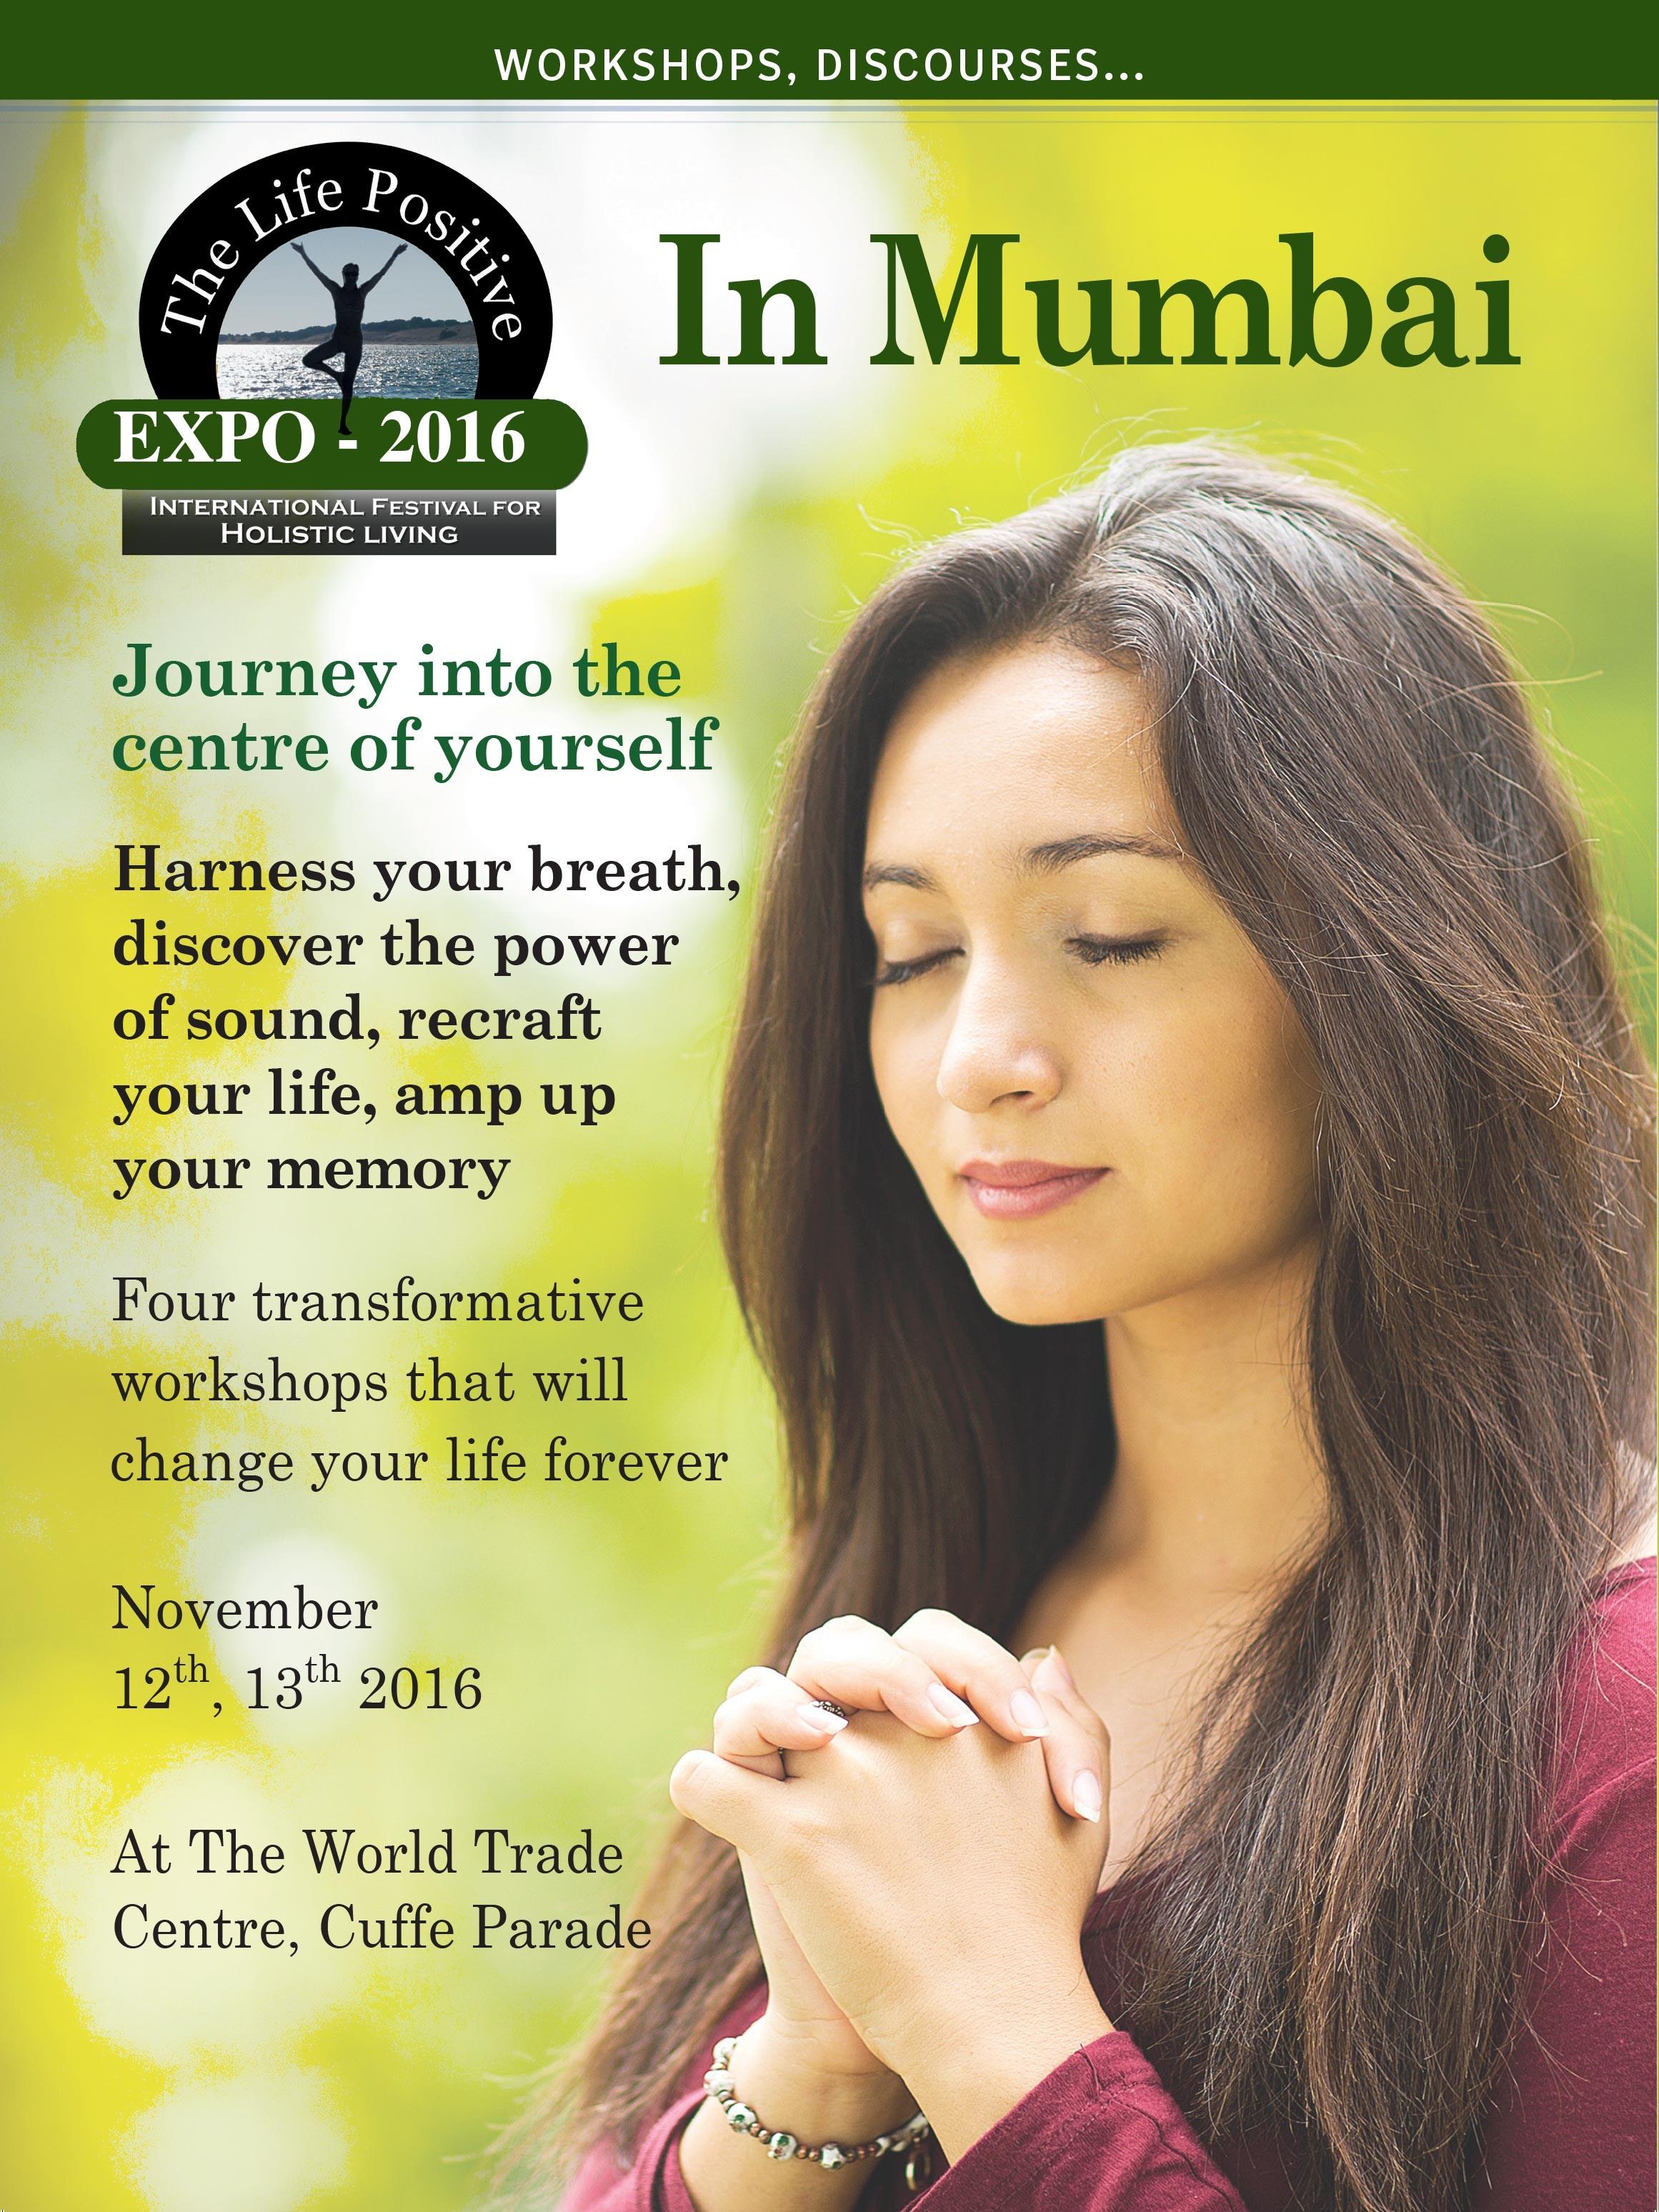 Life Positive Expo in Mumbai